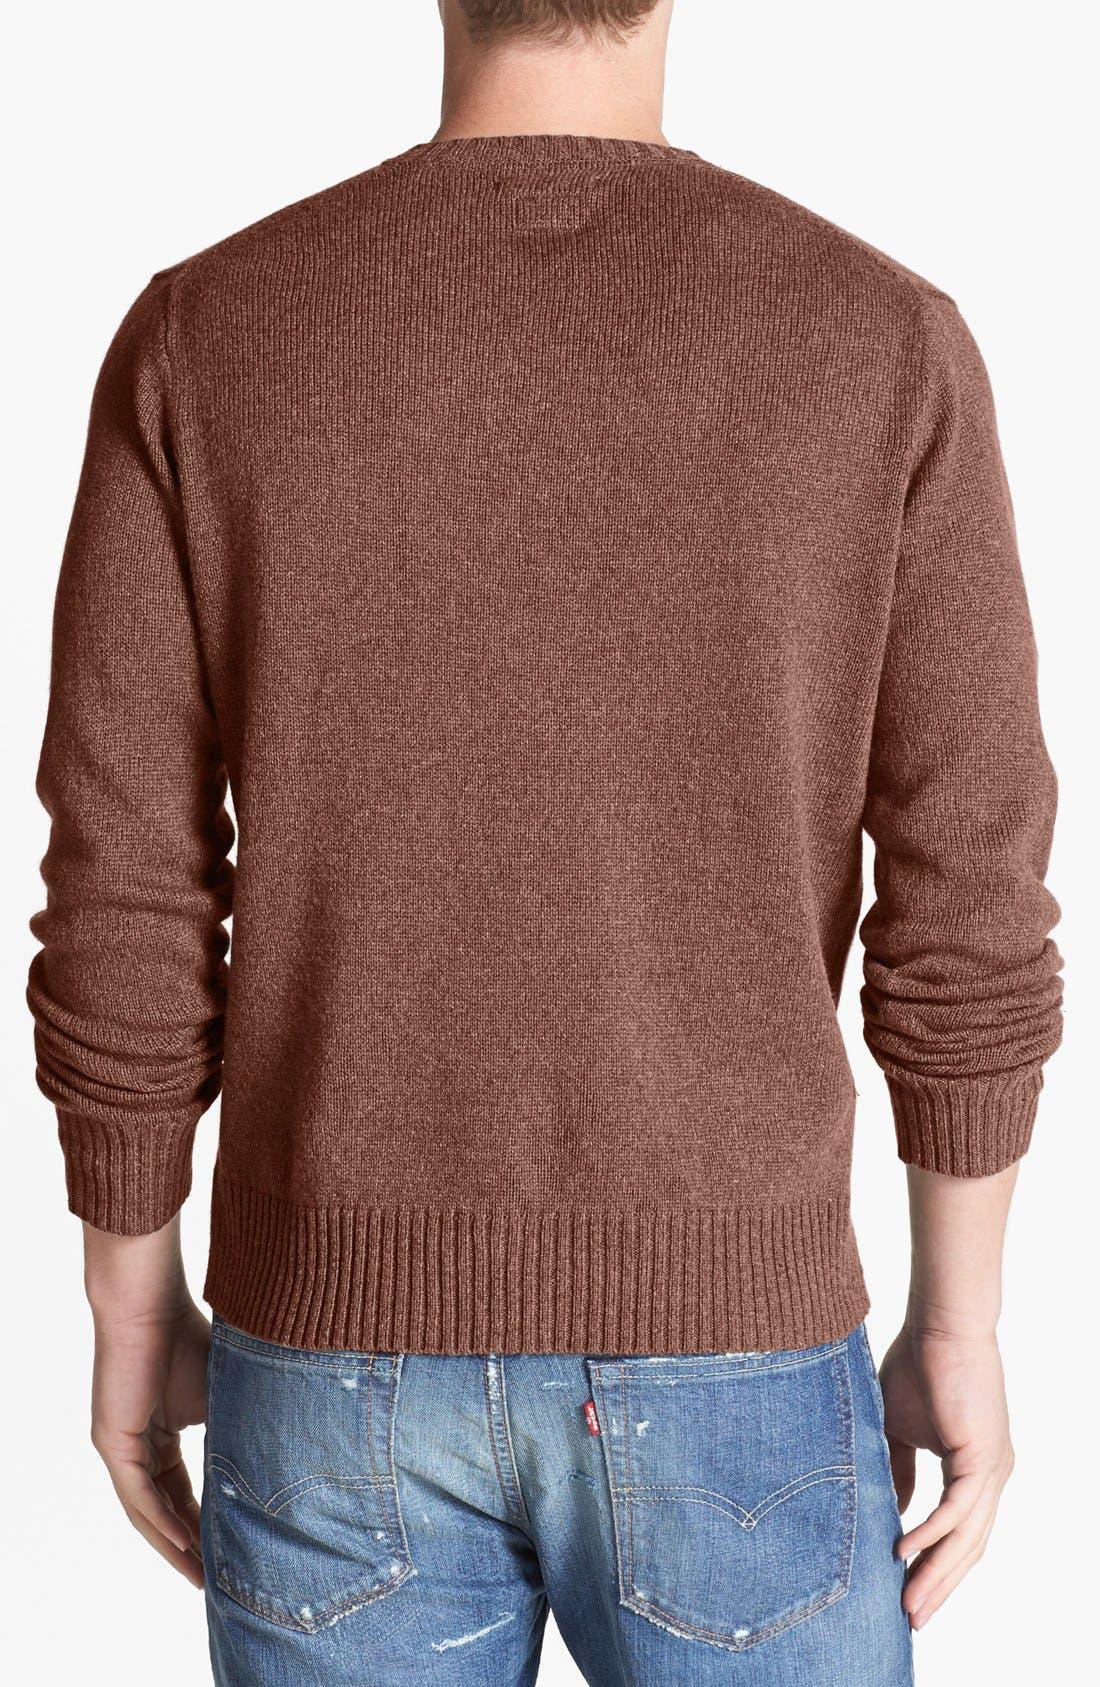 Alternate Image 2  - RVCA 'Briza' Crewneck Sweater